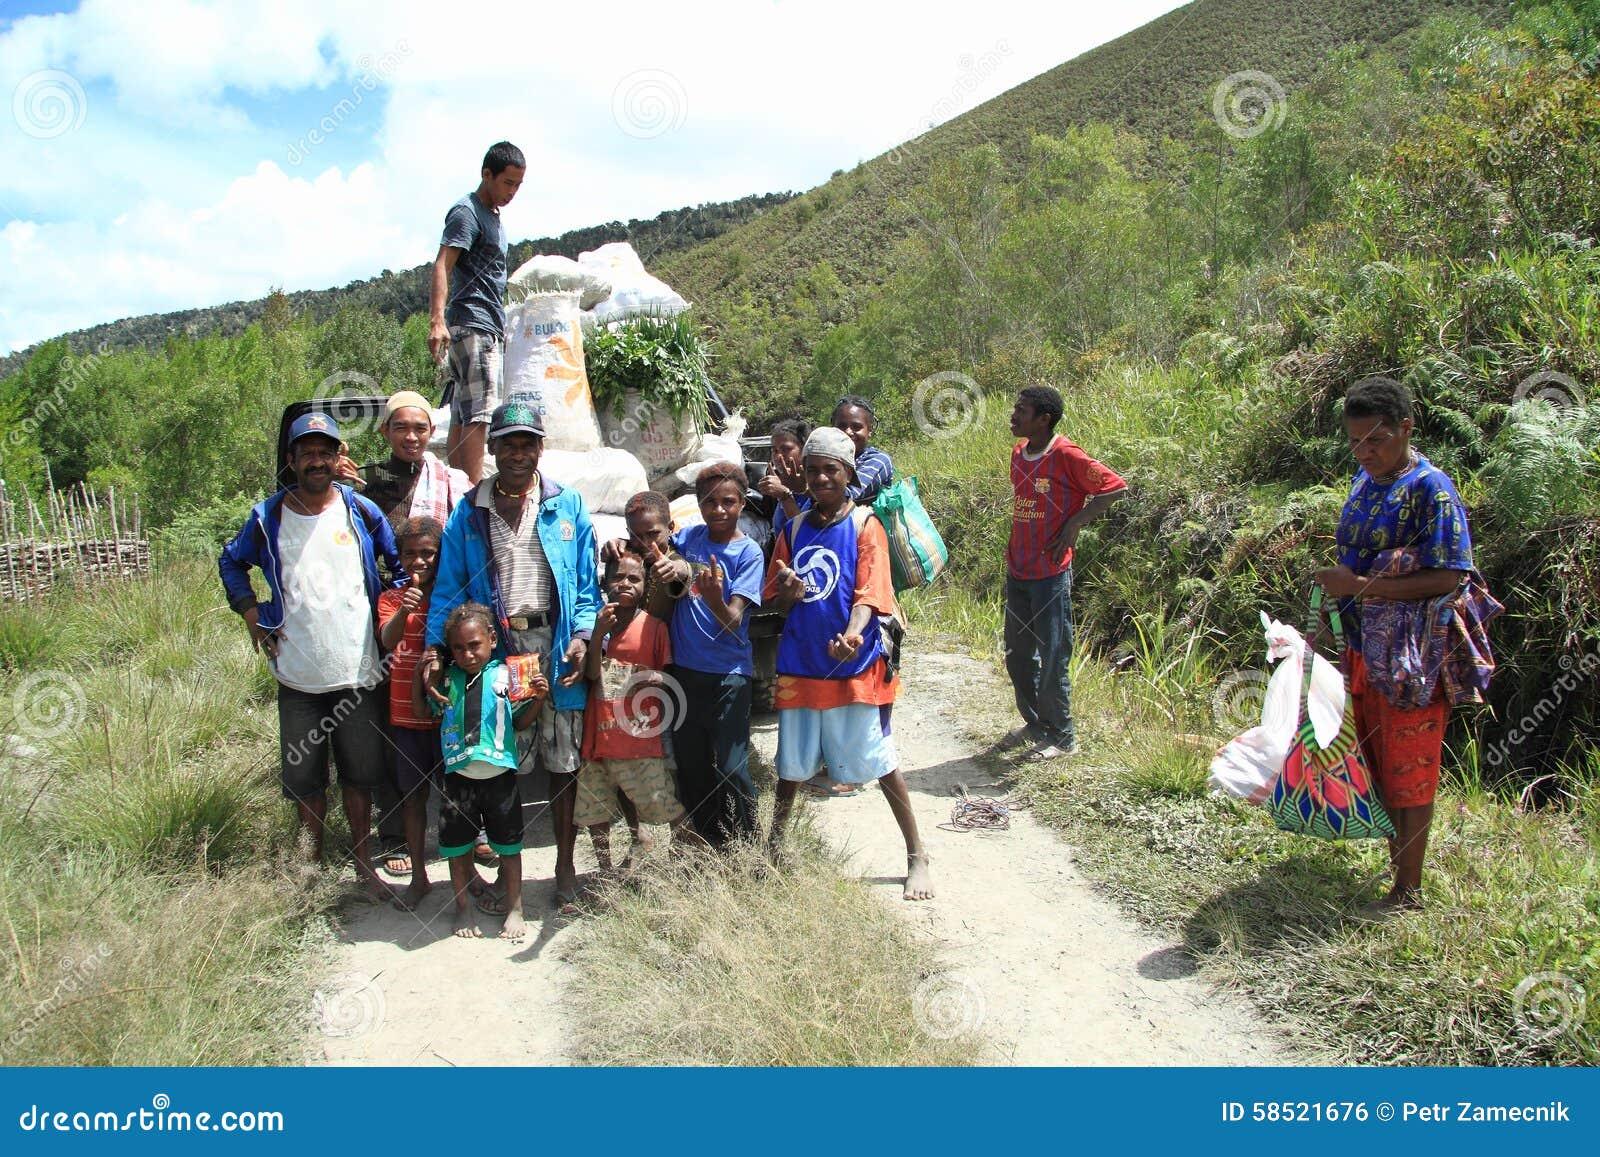 single parents atlanta ga Society of single parents inc address: 1045 mendell circle northeast, atlanta, ga 30319, united states phone: +1 770-820-5736.